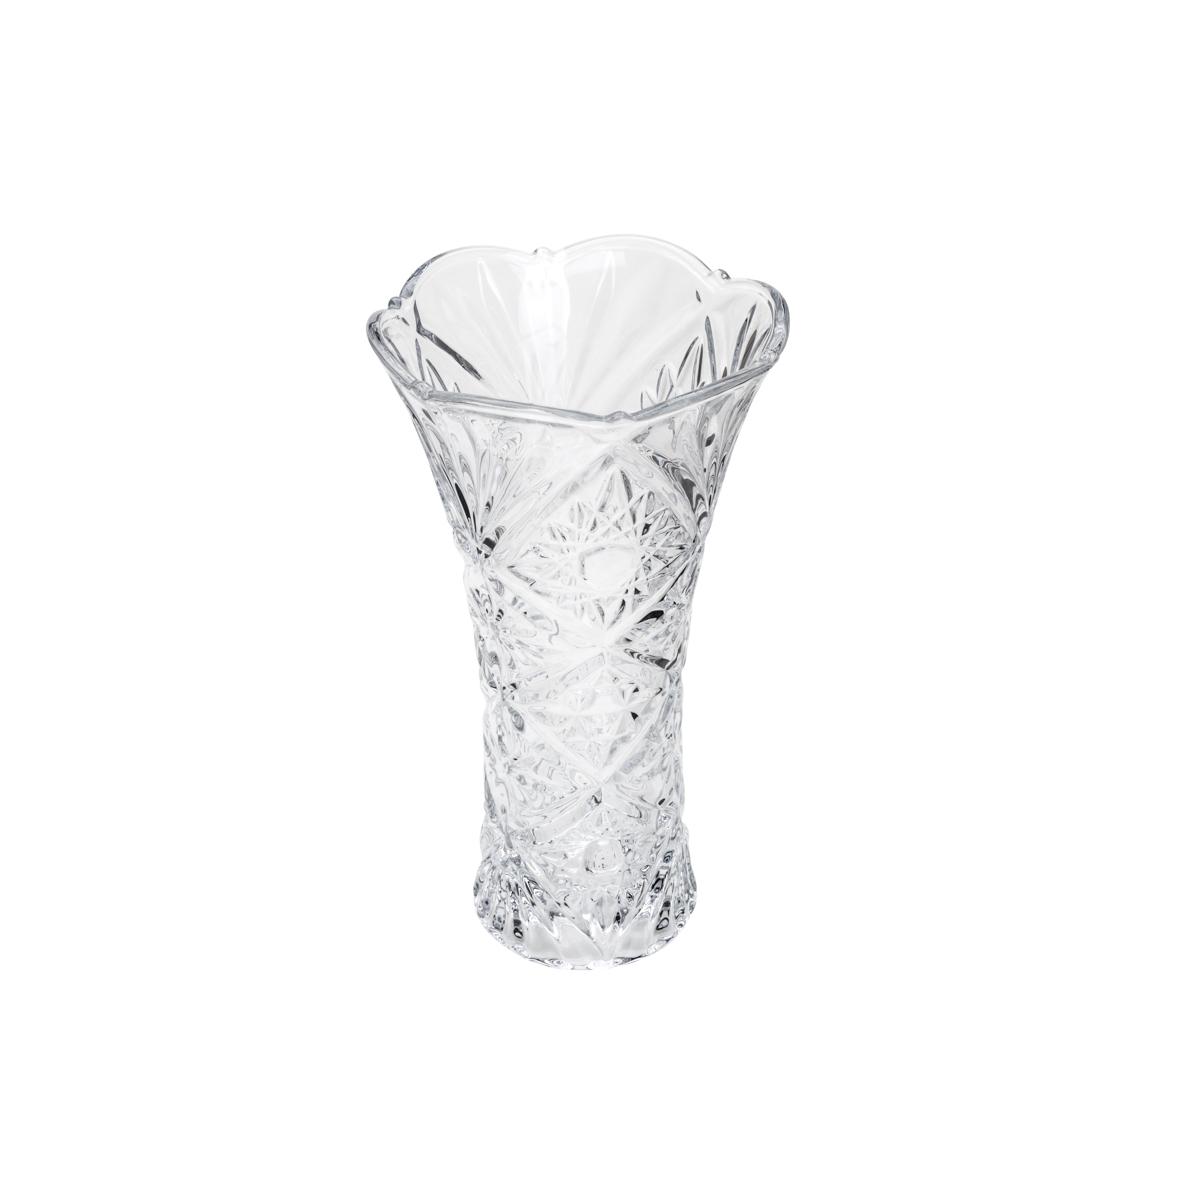 Vaso vidro sodo-calcico Petals 13x8x24cm Red Cherry